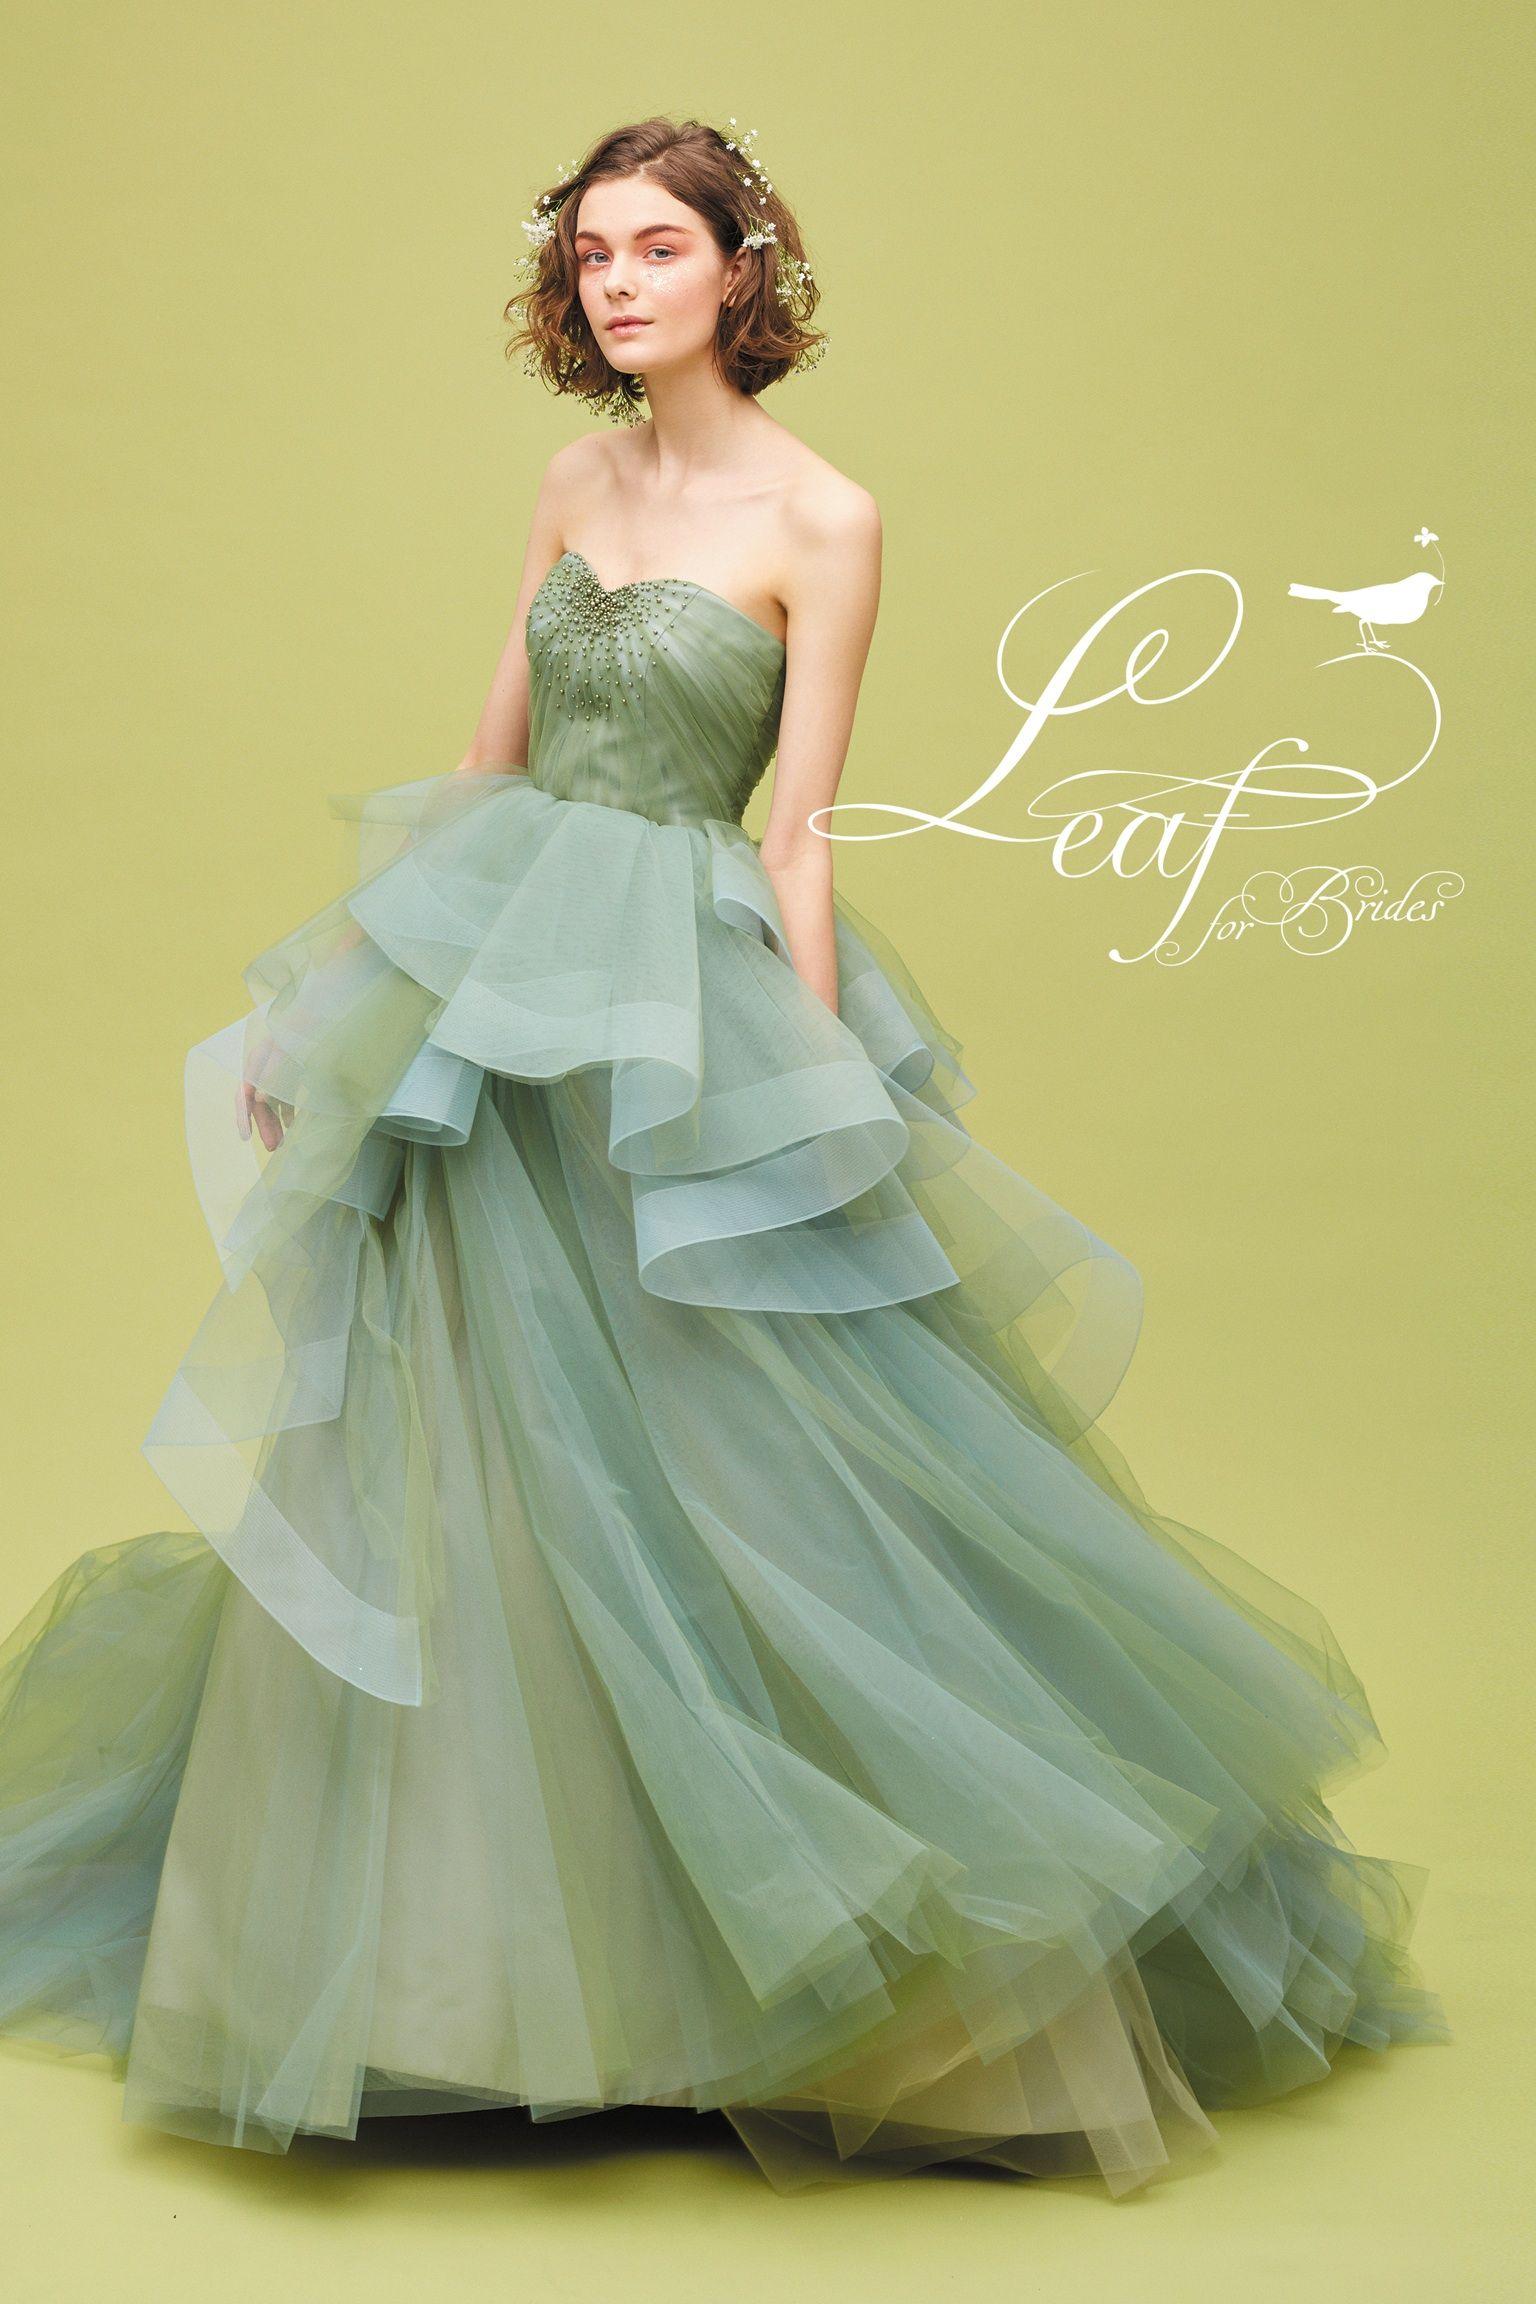 676bd9cf45724 カラードレスのLeaf for Brides|ミツワ(香川・高松・宇多津)